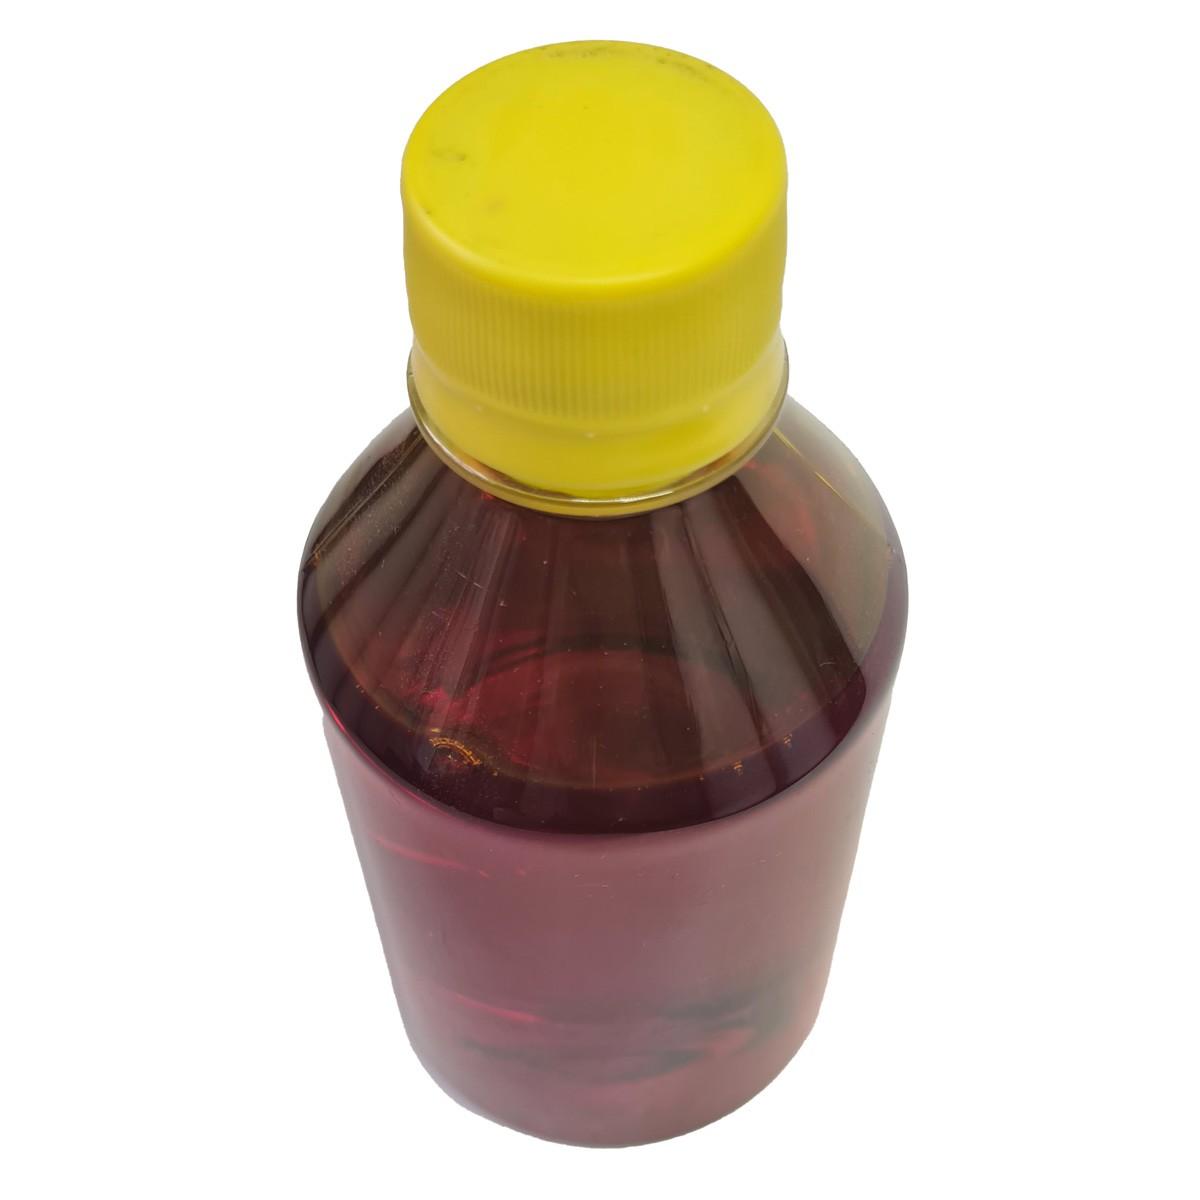 250ml de tinta Amarelo para recarga de cartuchos